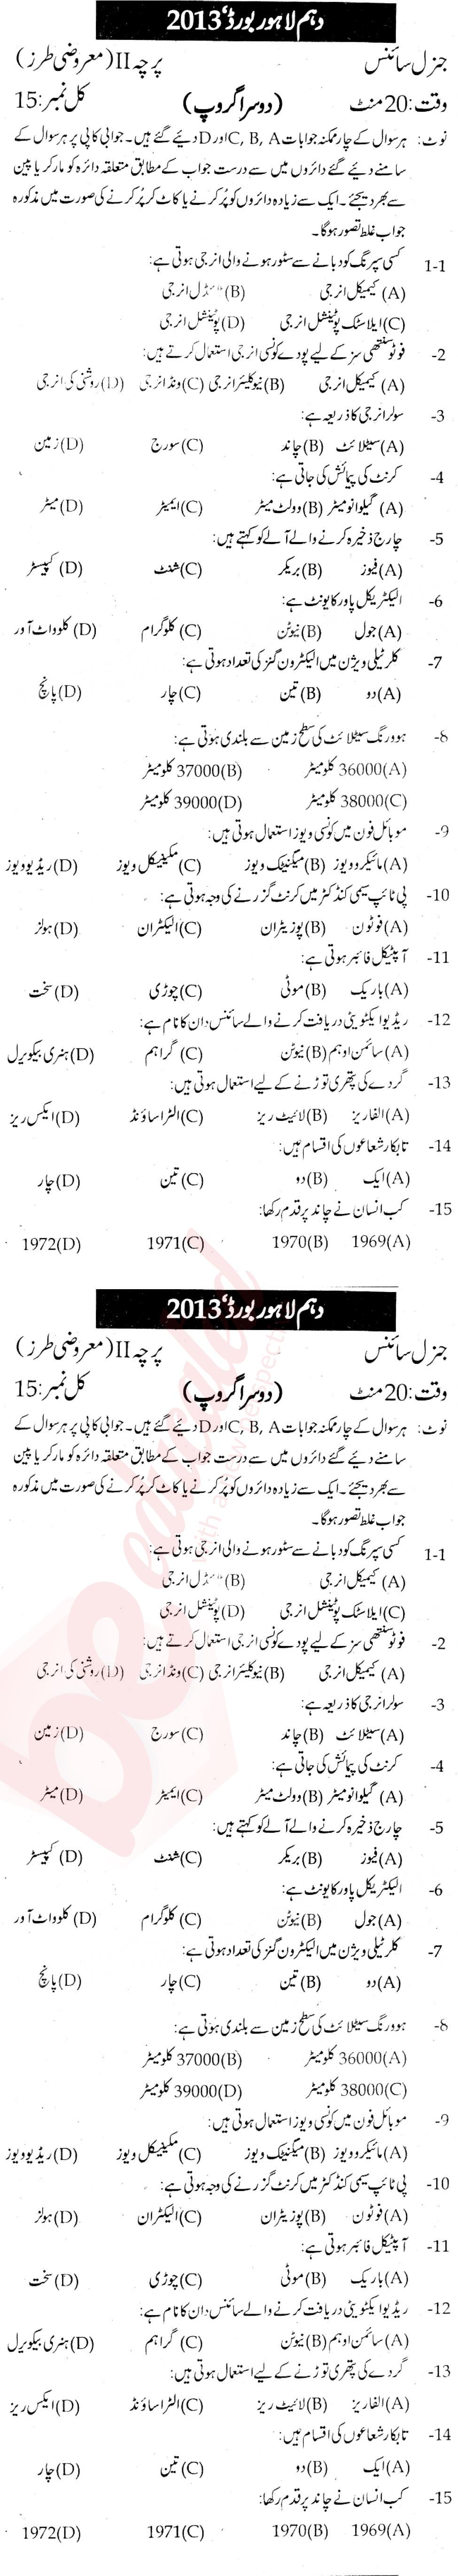 general science subject bise lahore 10th class urdu medium